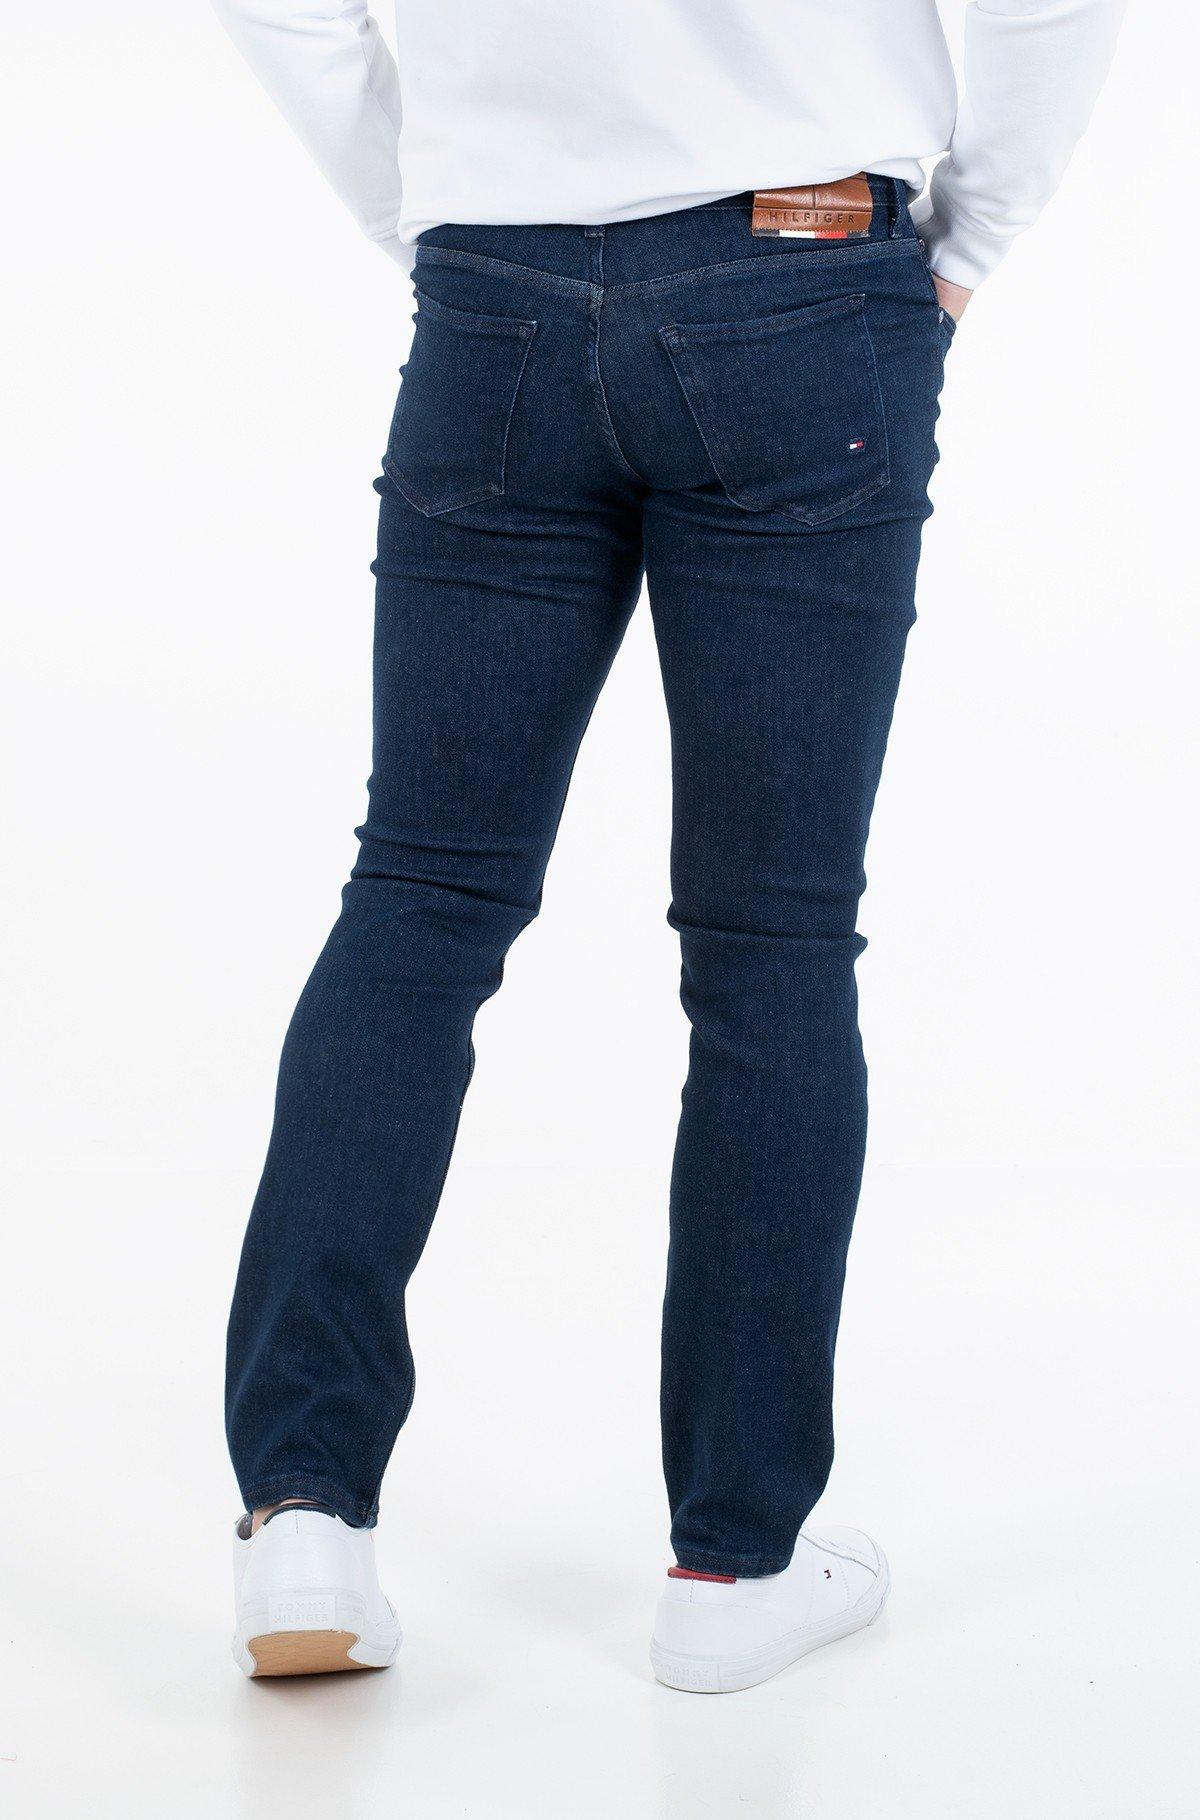 Jeans SLIM BLEECKER HSTR SELBY BLUE-full-2